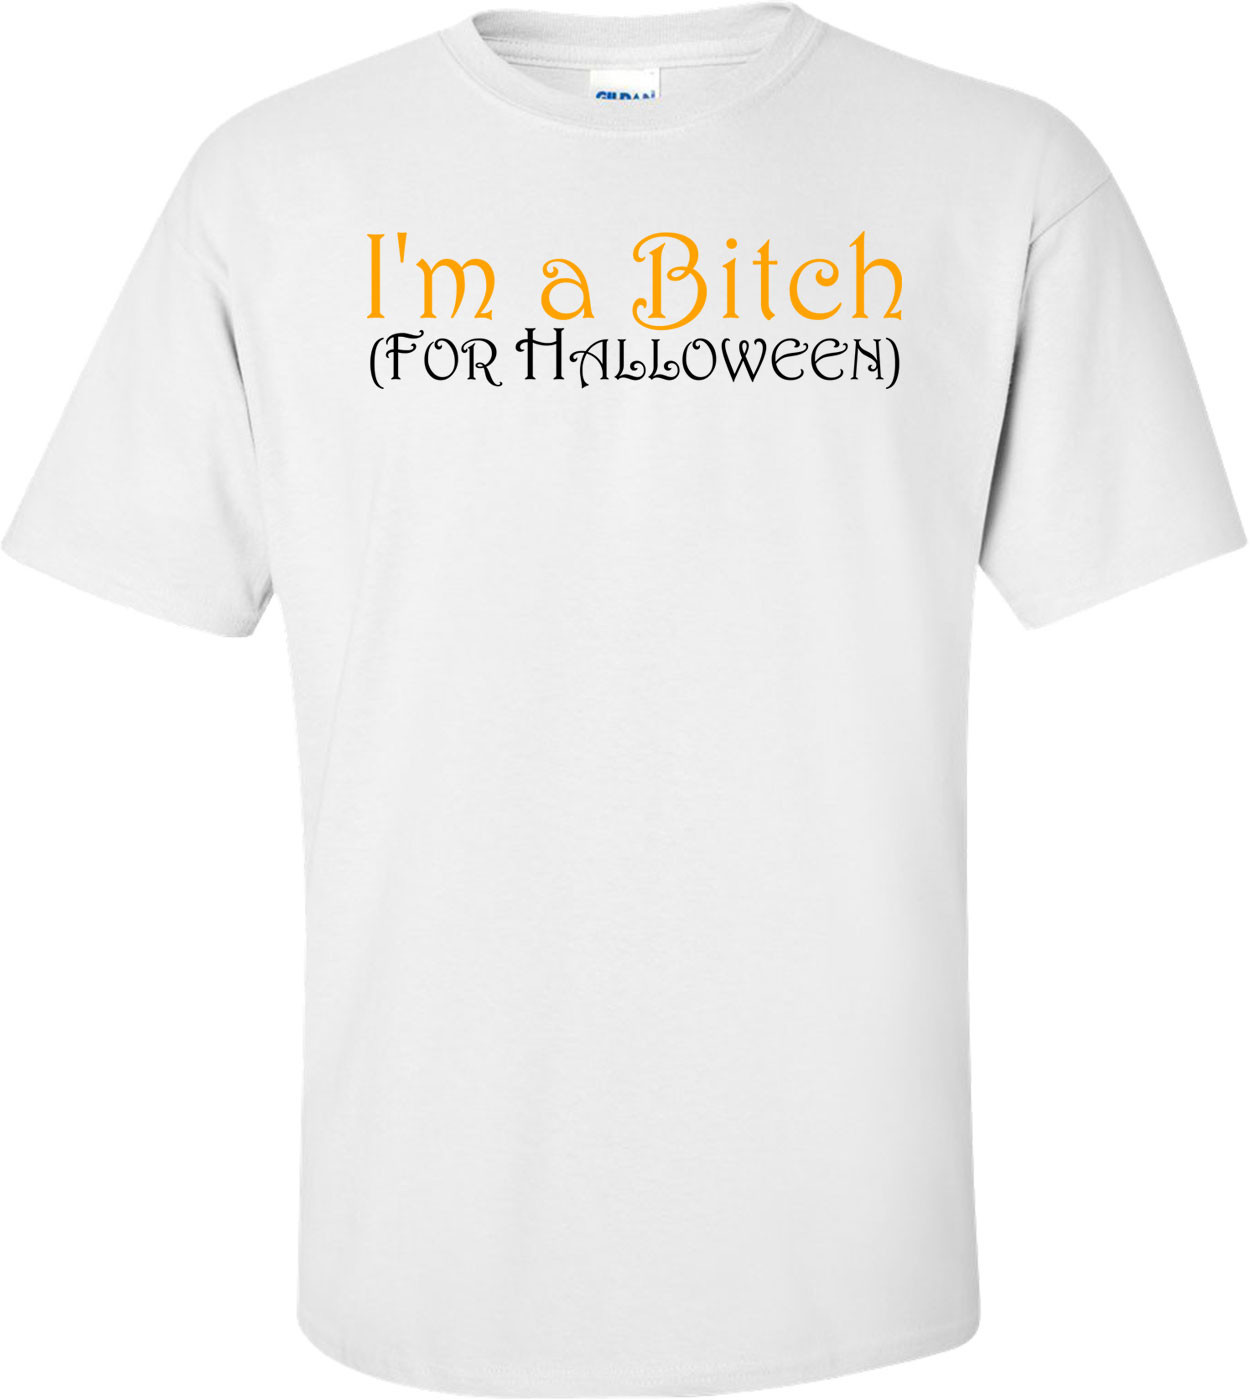 I'm A Bitch For Halloween - Halloween